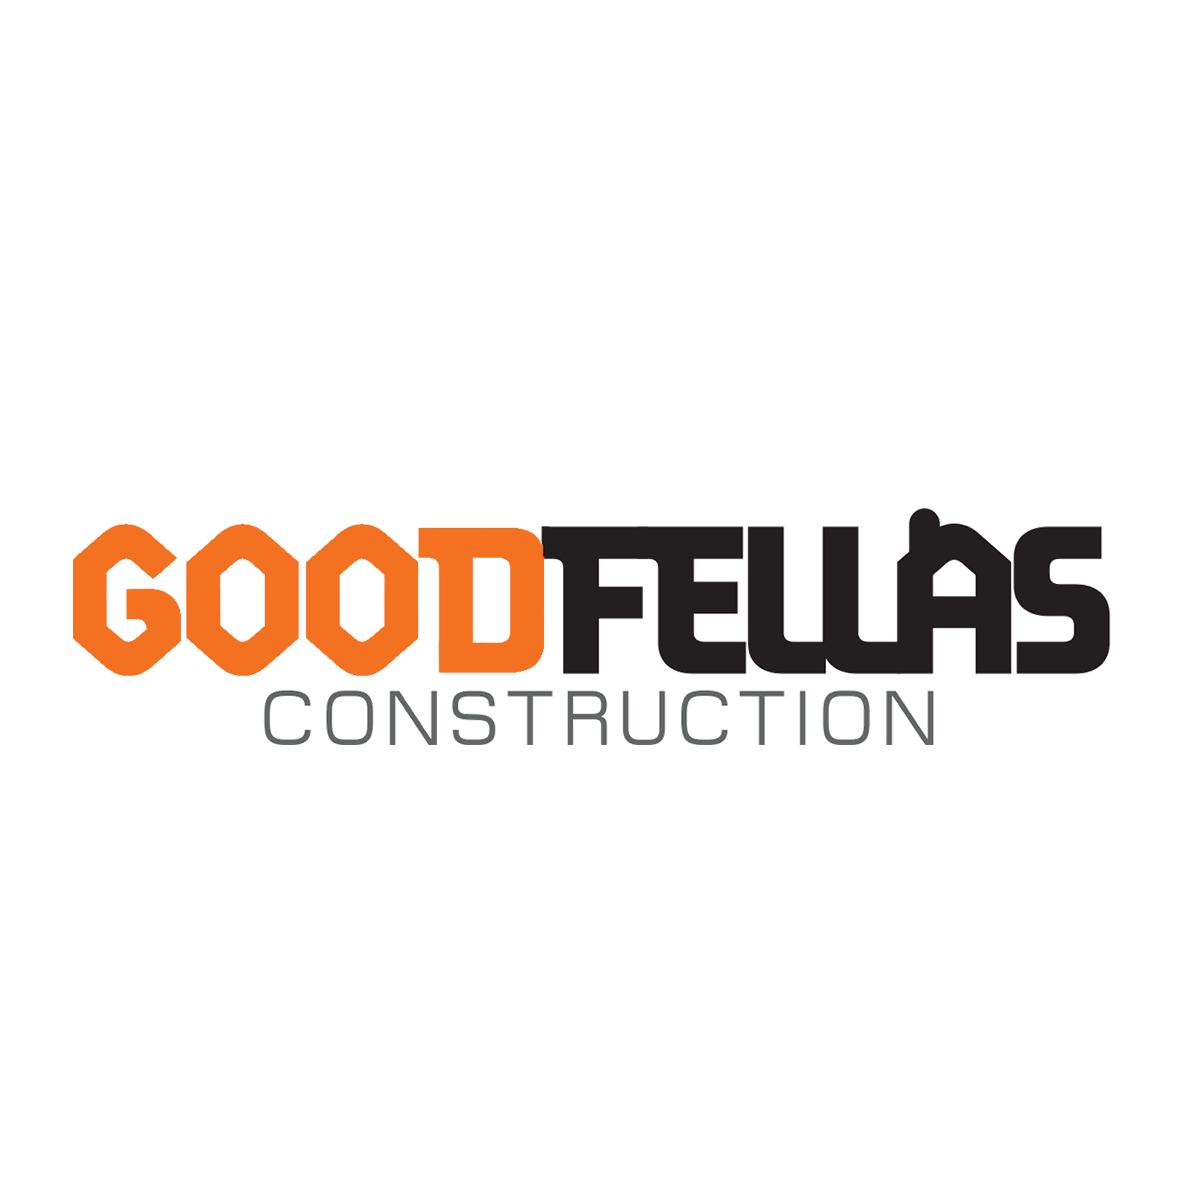 Goodfellas coupons